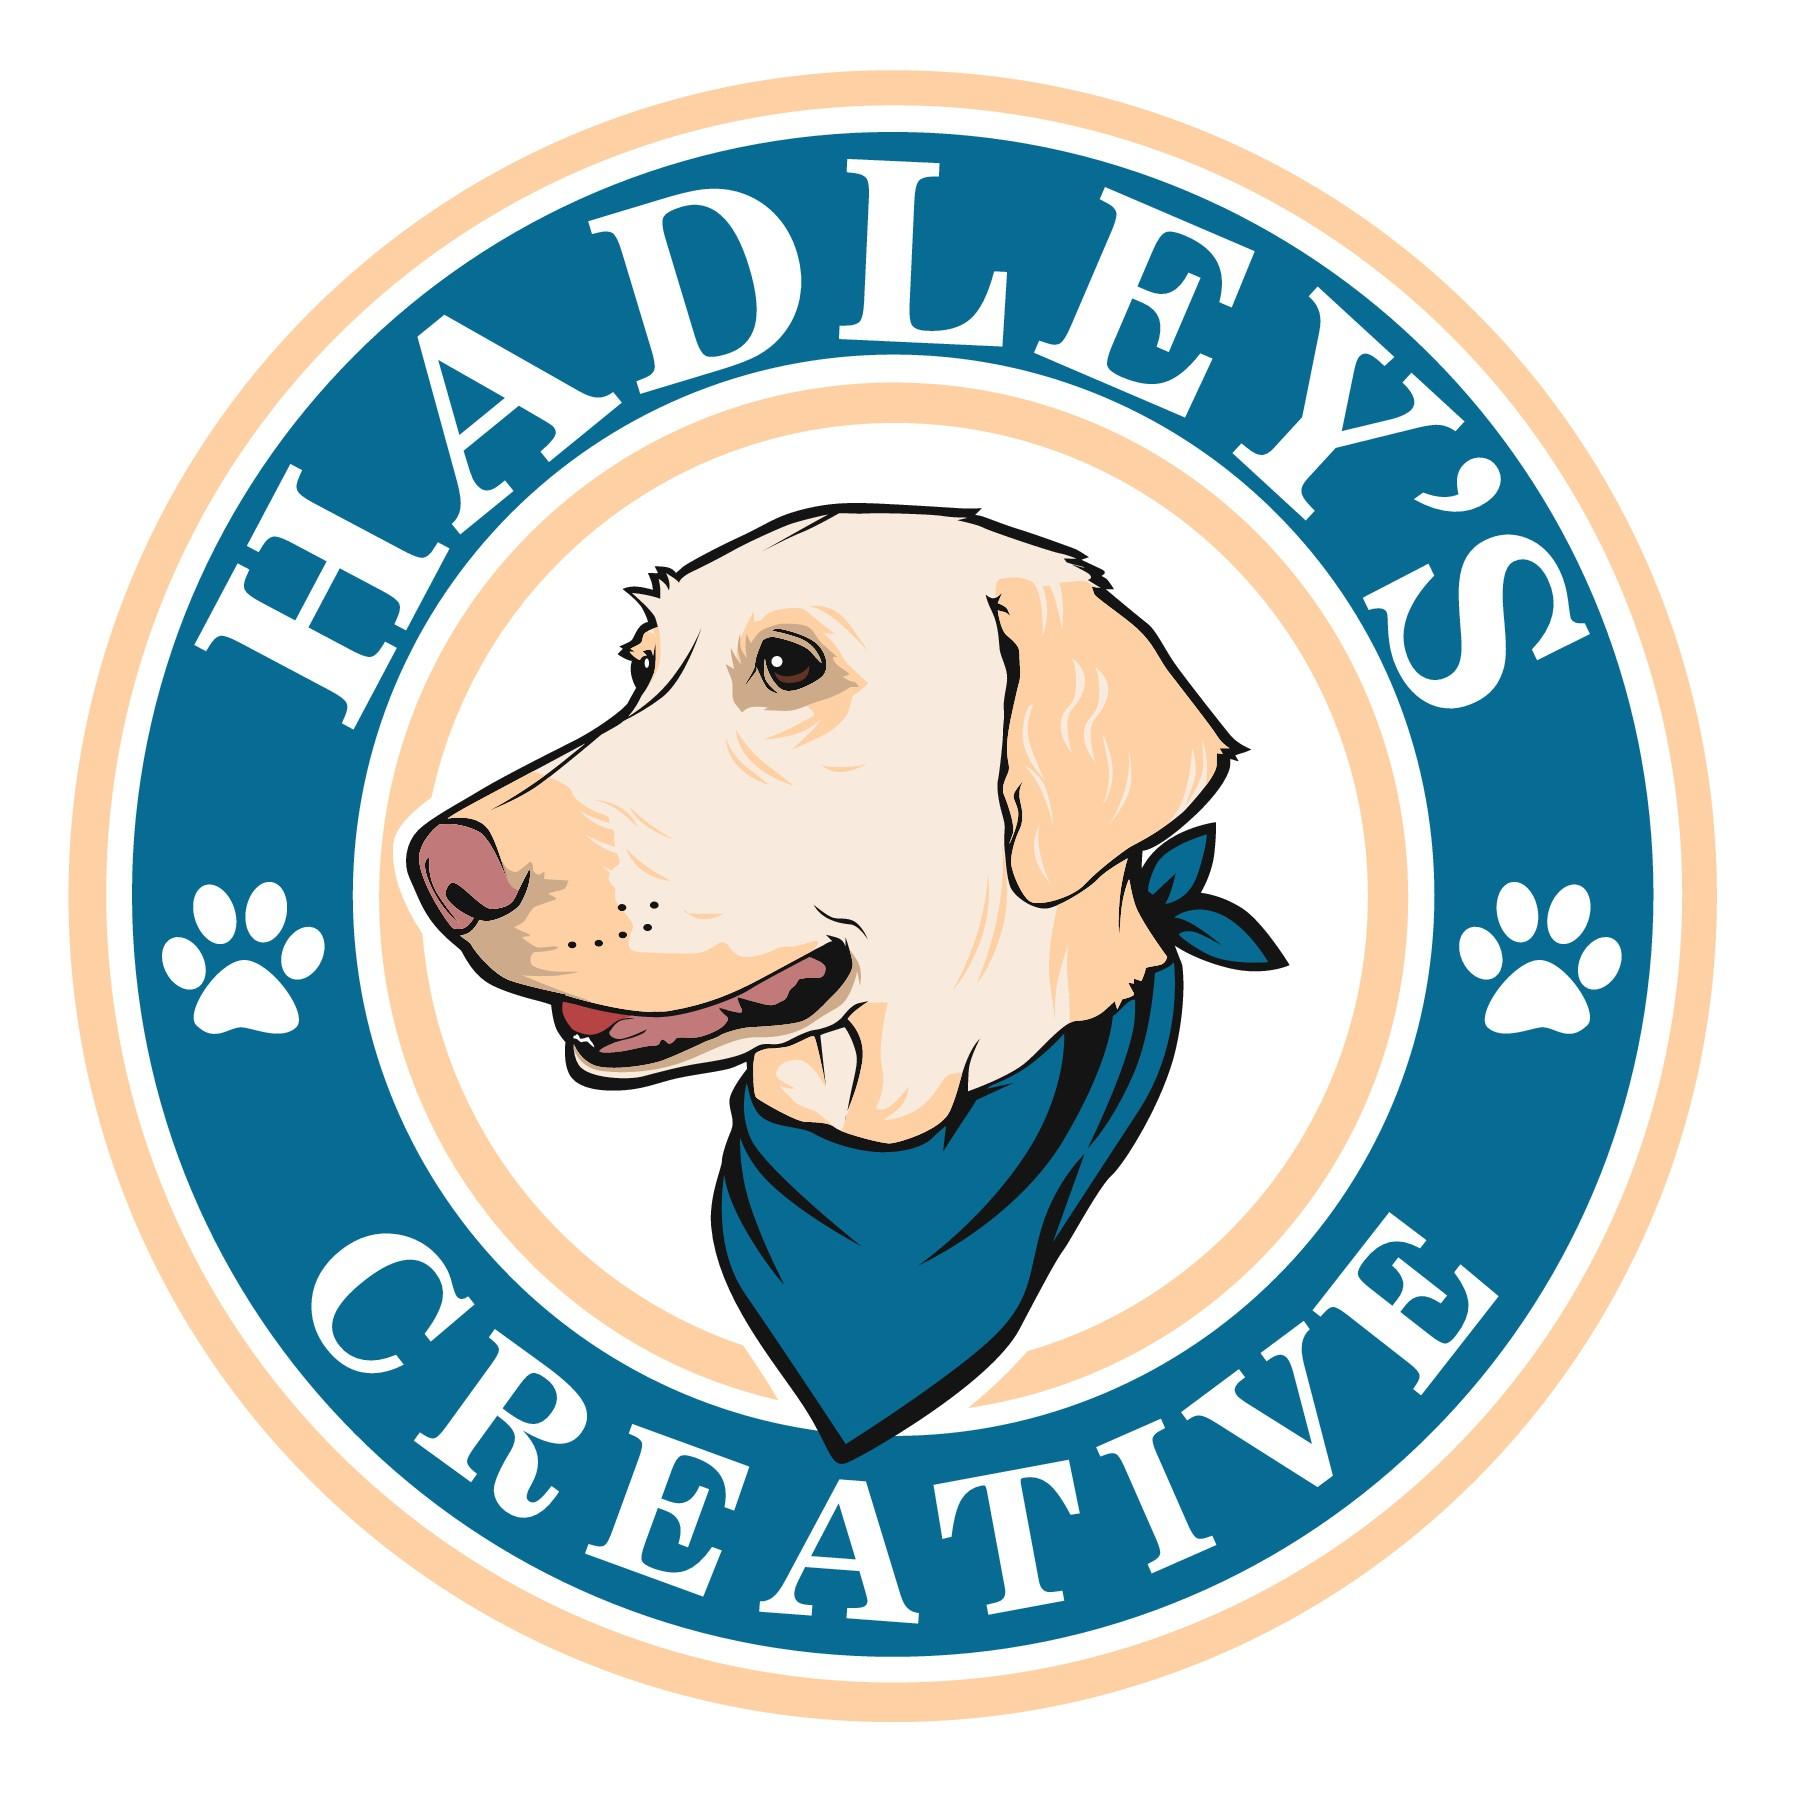 Create a captivating original logo for Hadley's Creative